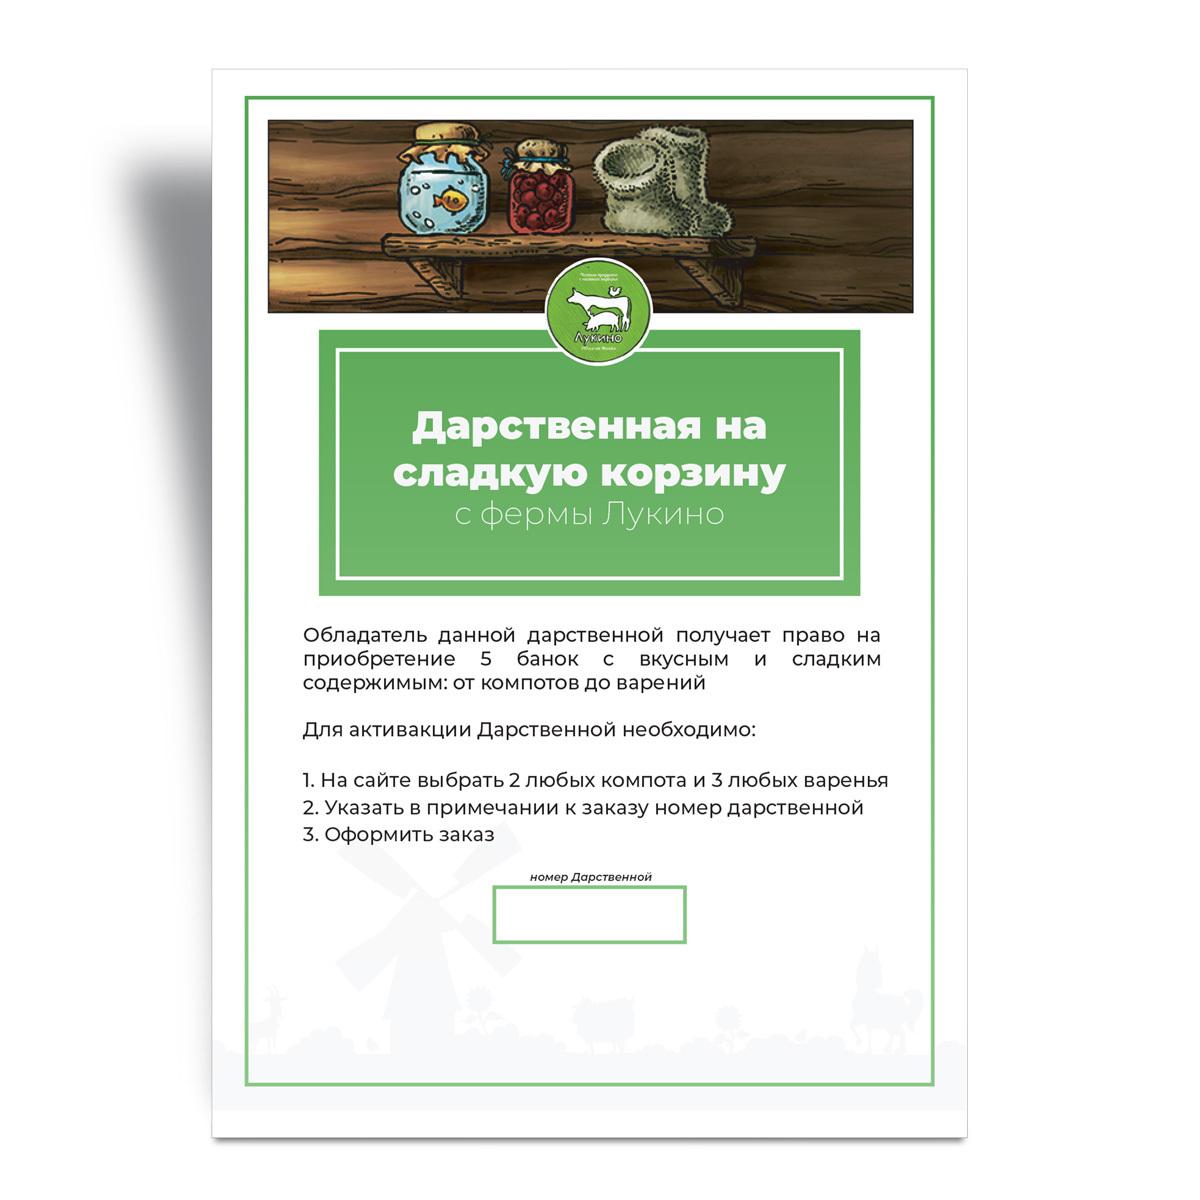 Сертификат на сладкую корзину